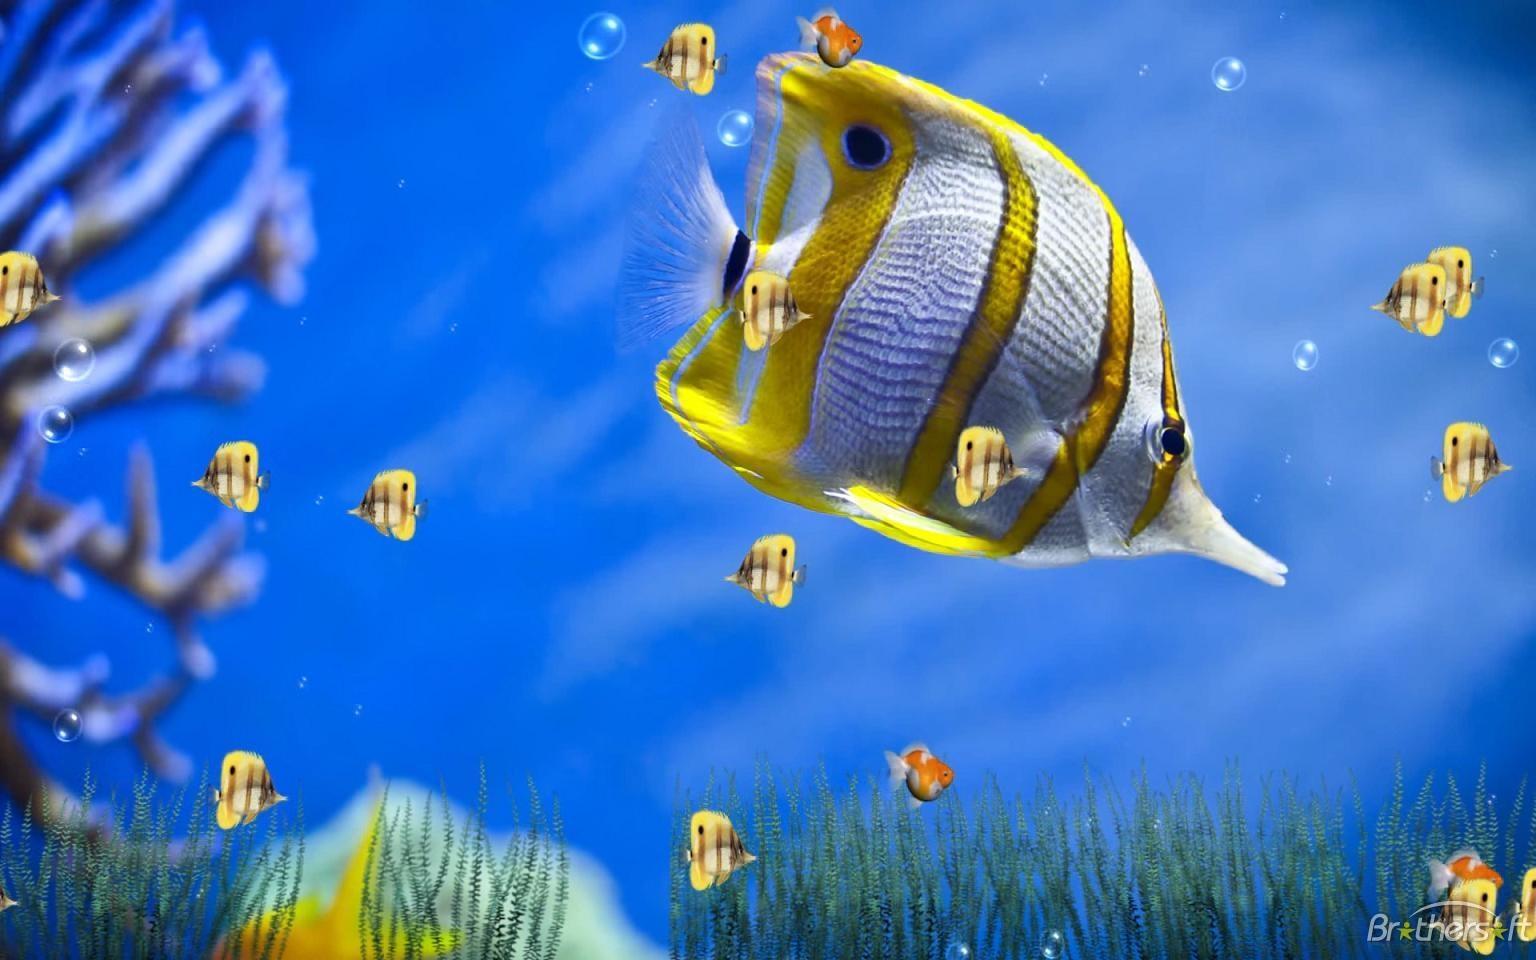 Download Marine Life Aquarium Animated Wallpaper Marine Life 1536x960